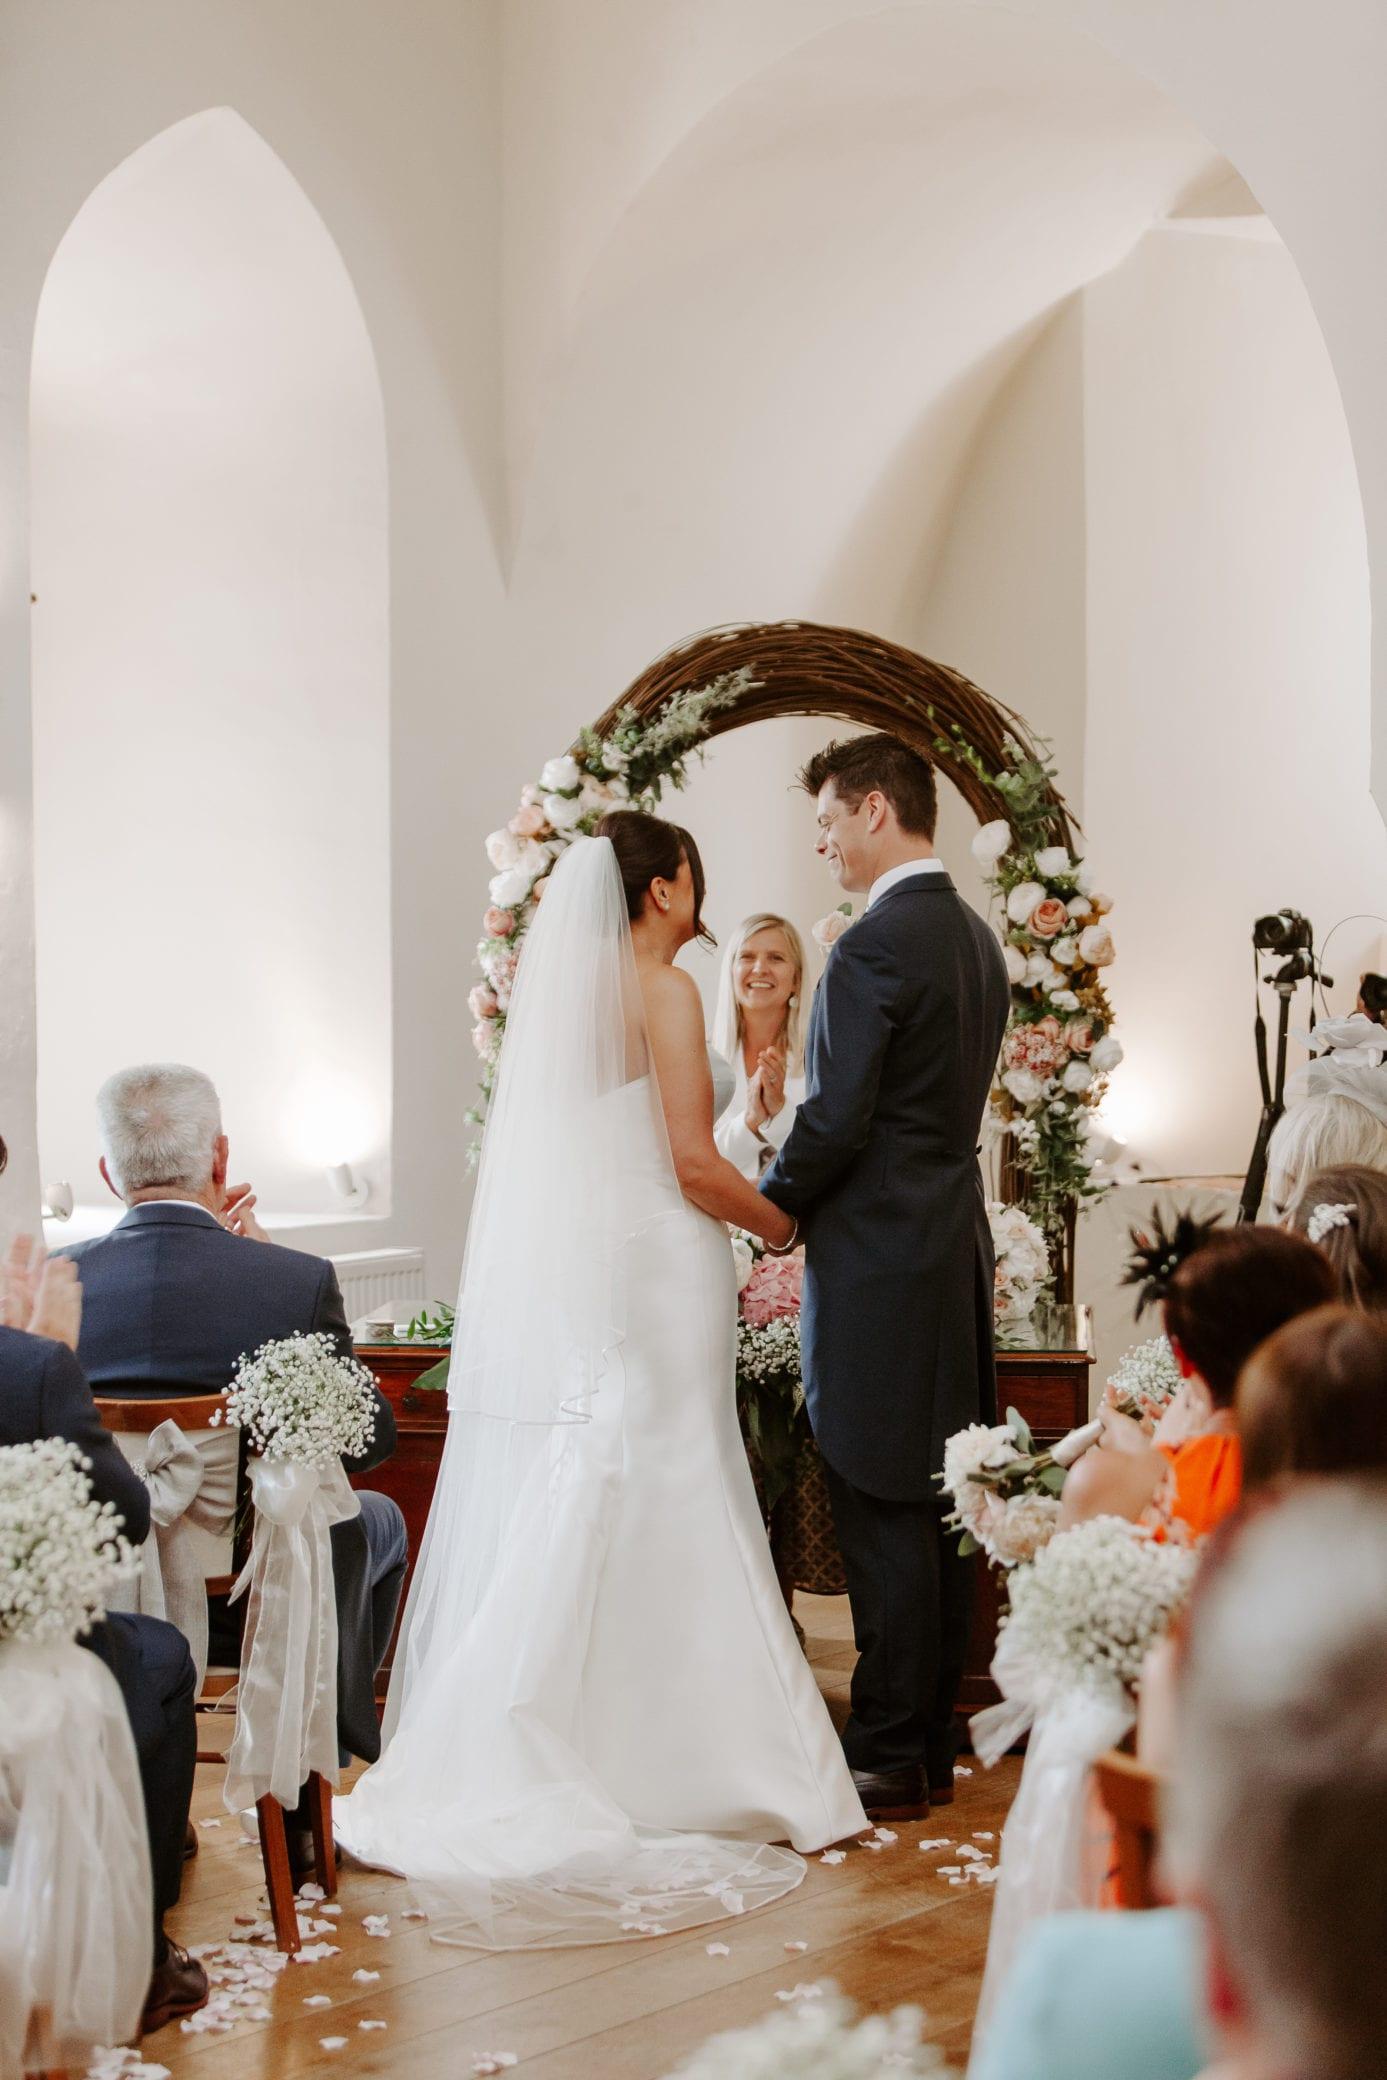 Wedding ceremonies at Farnham Castle in Surrey